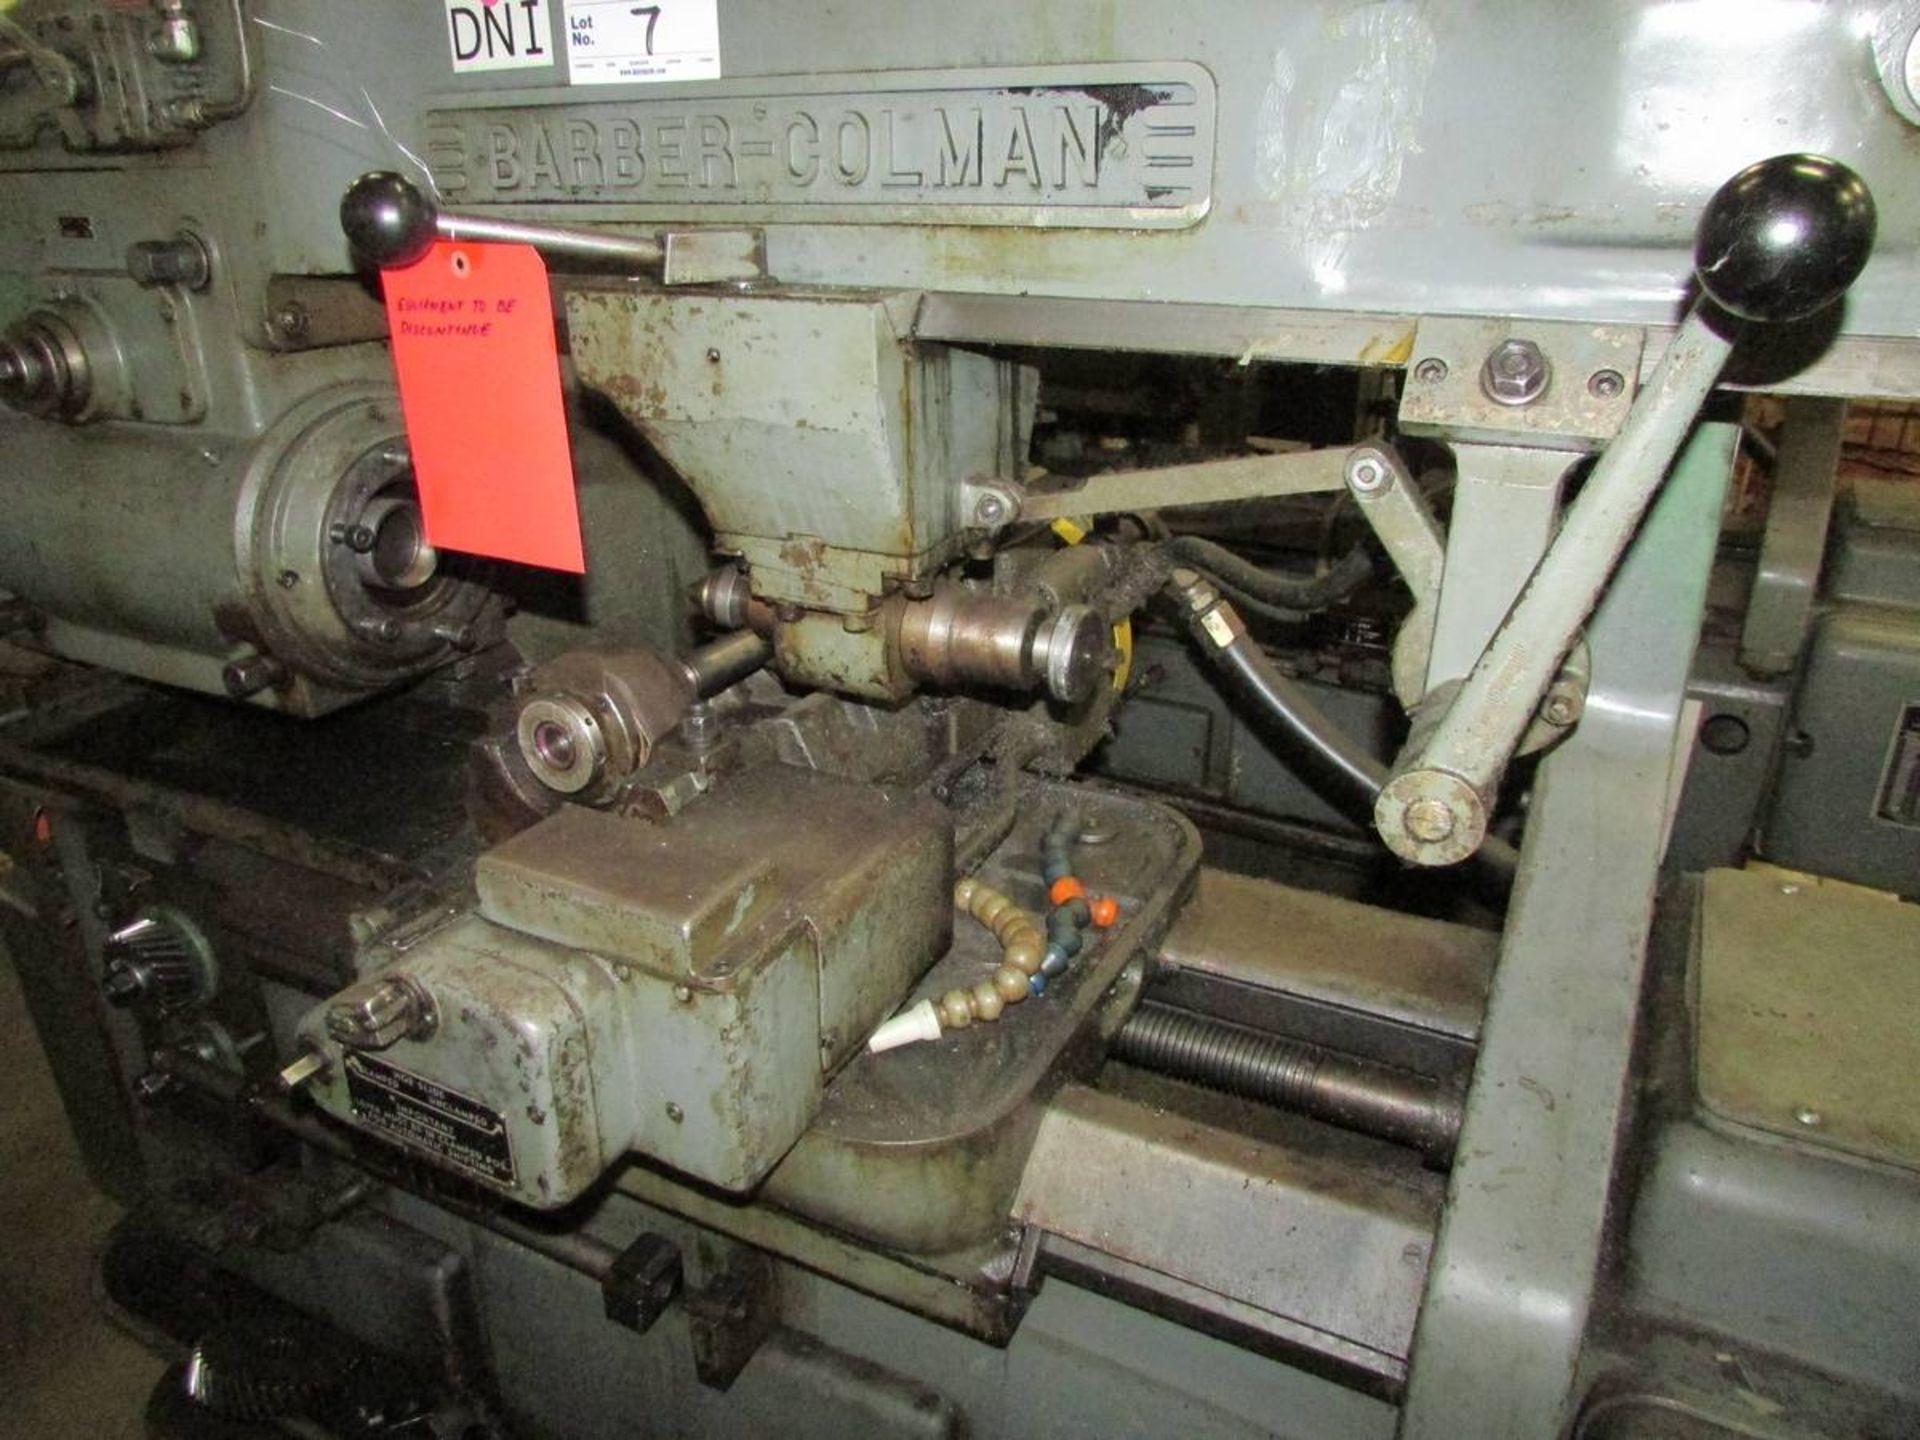 Barber Colman 16-16 Gear Hobbing Machine - Image 12 of 24